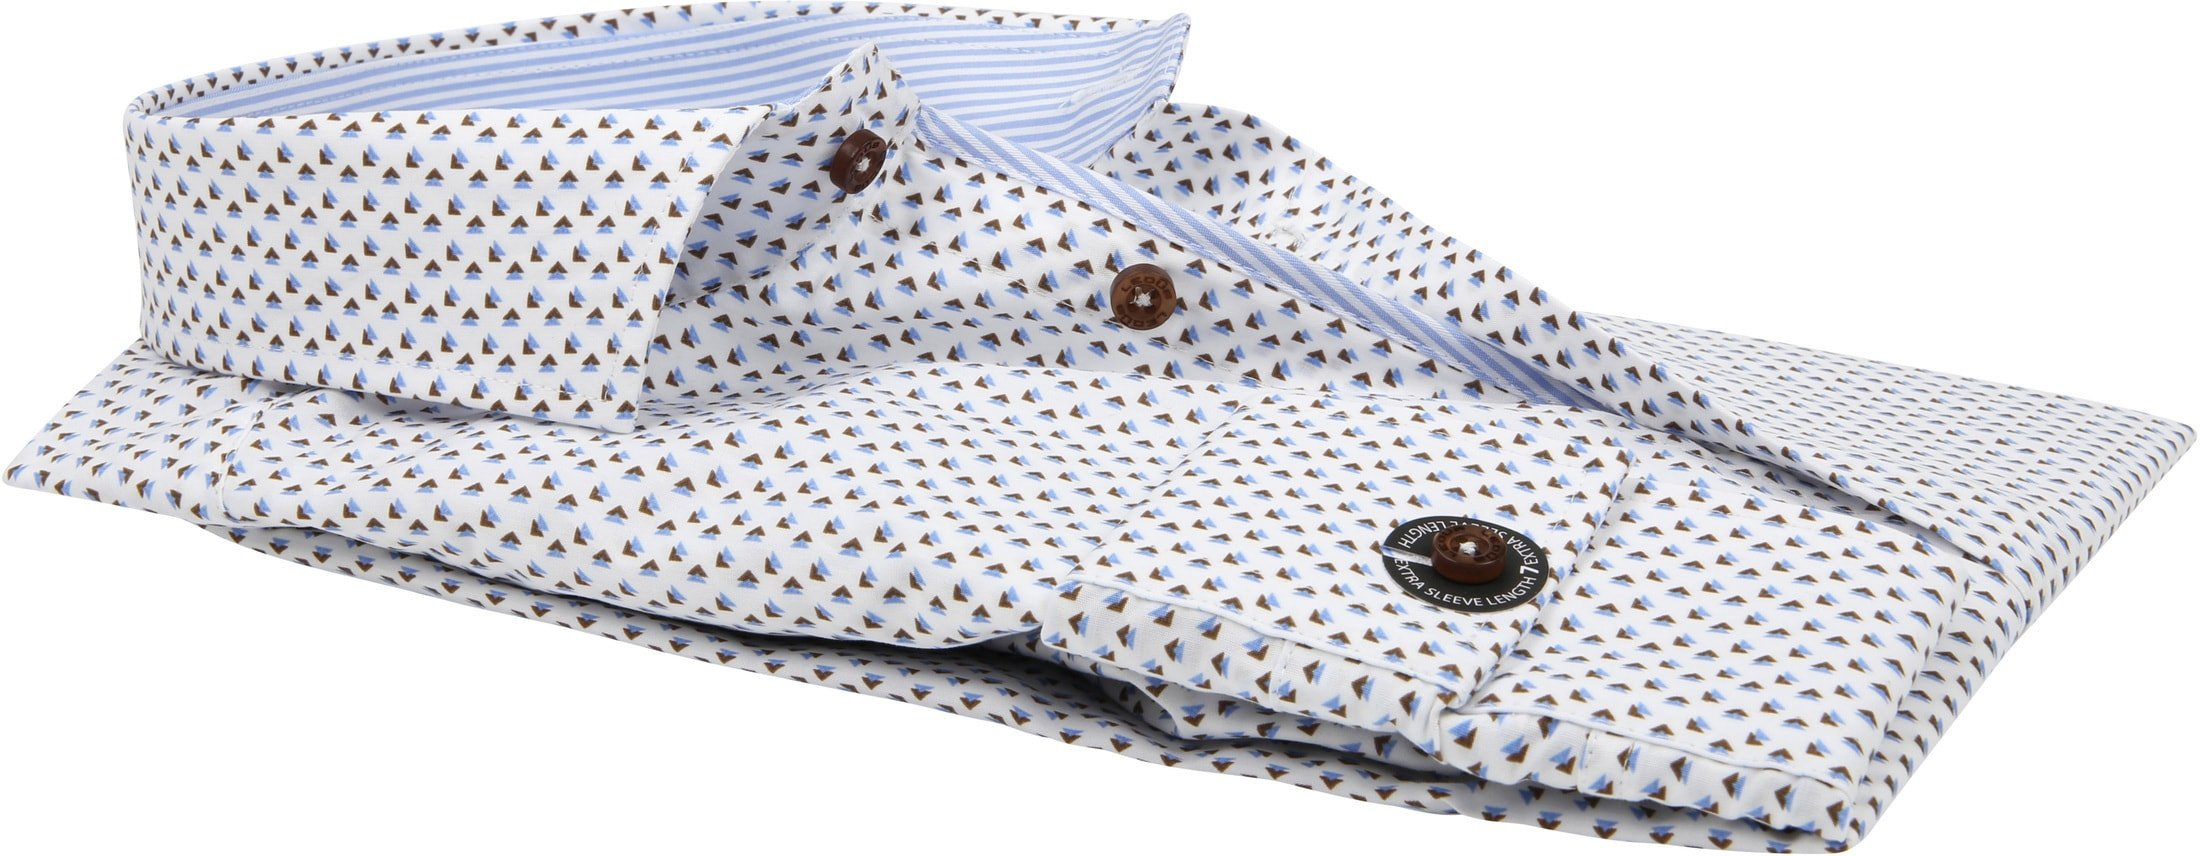 Ledub Overhemd Print Bruin Blauw SL7 foto 2